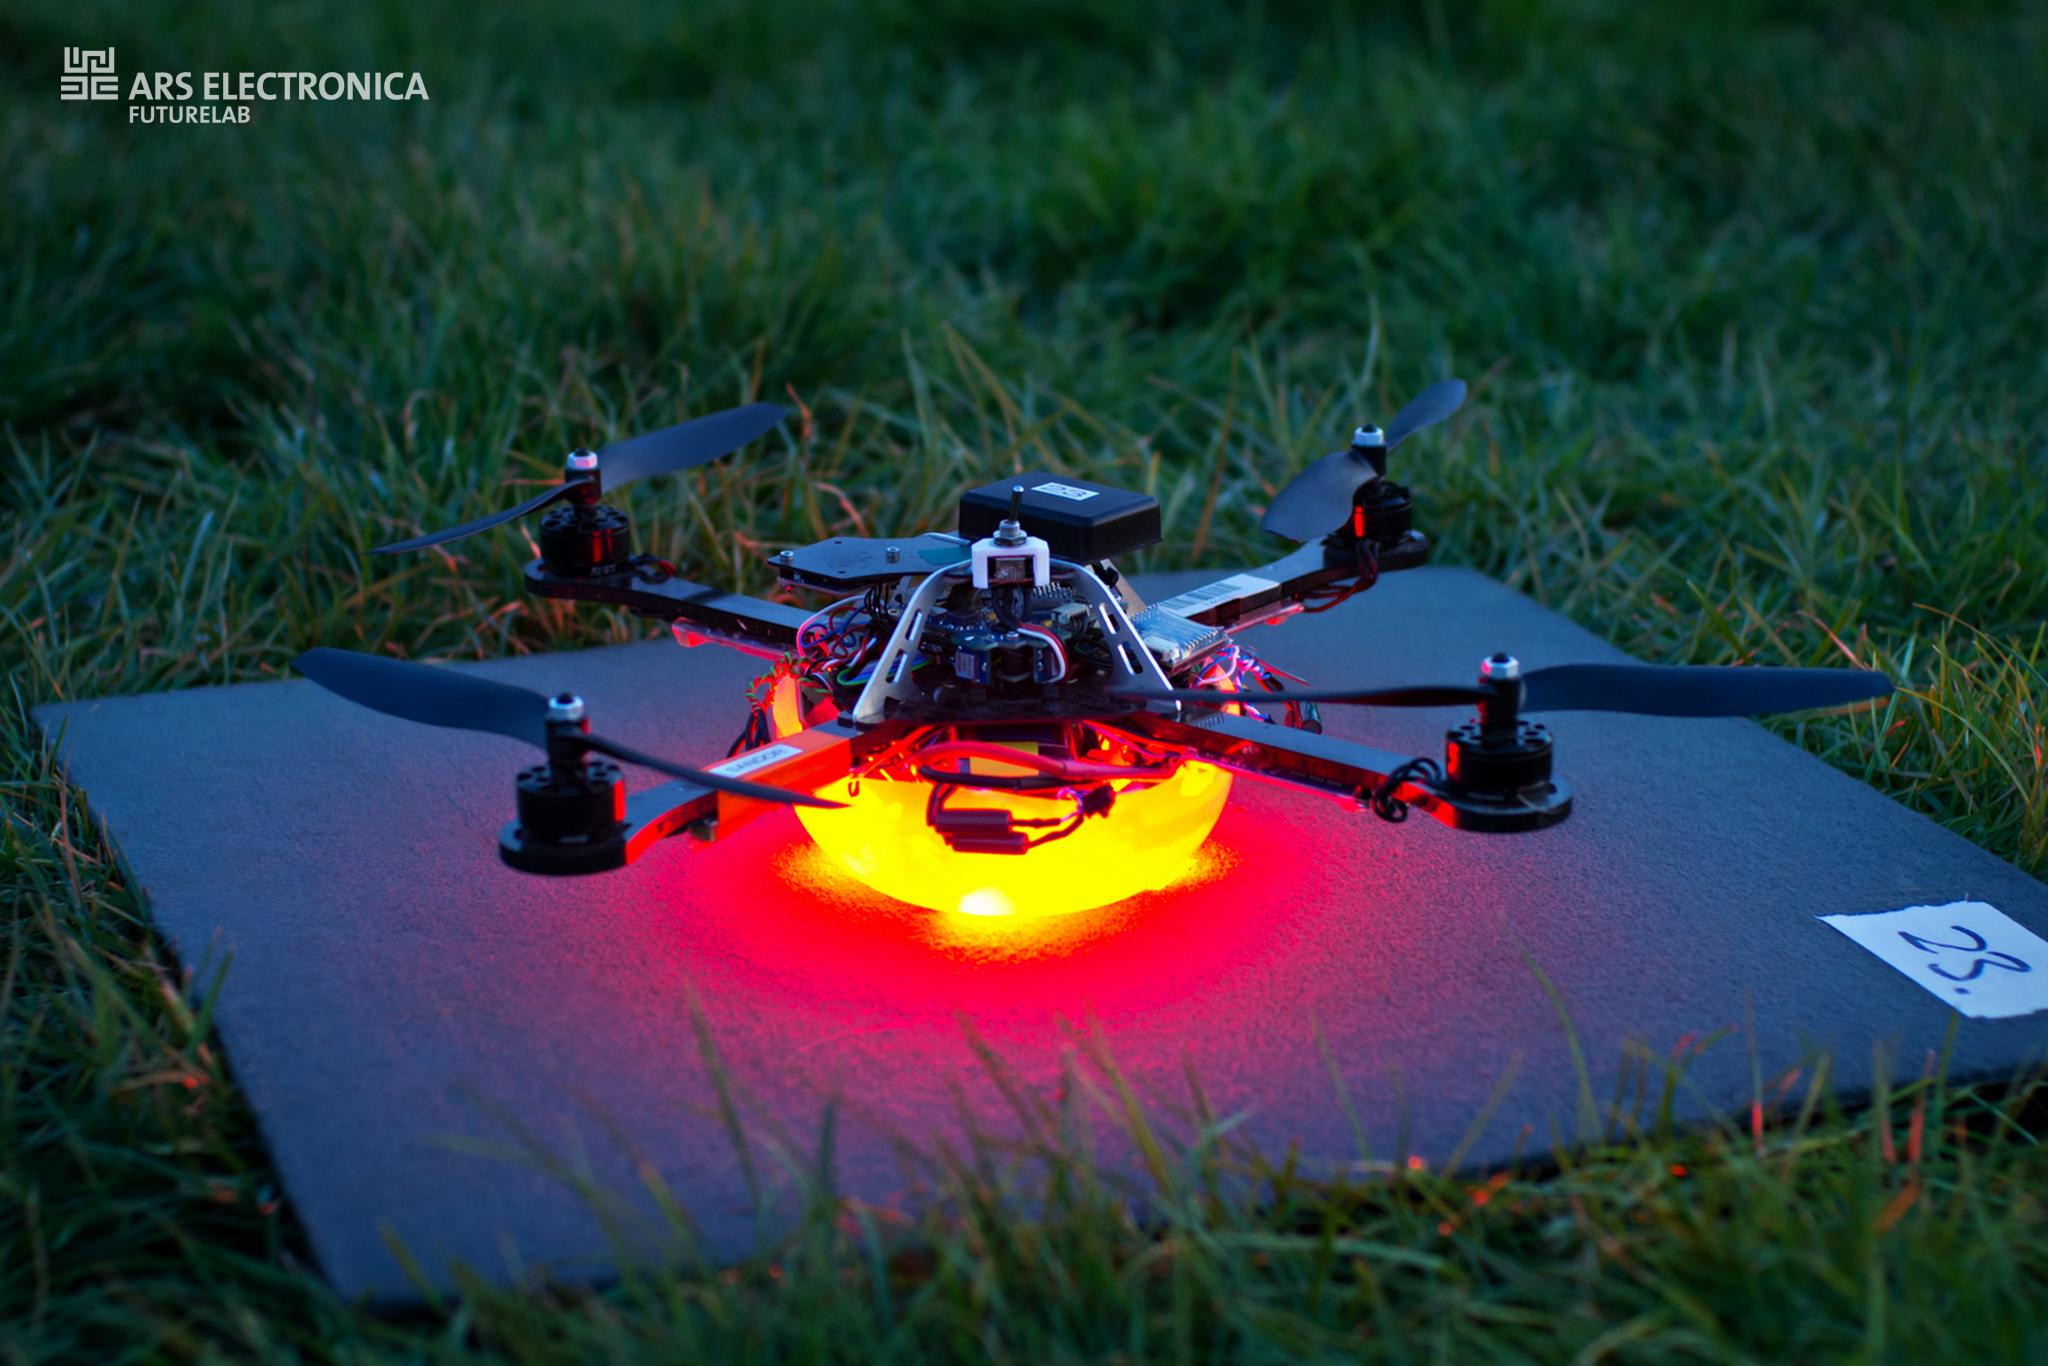 Incredible drones